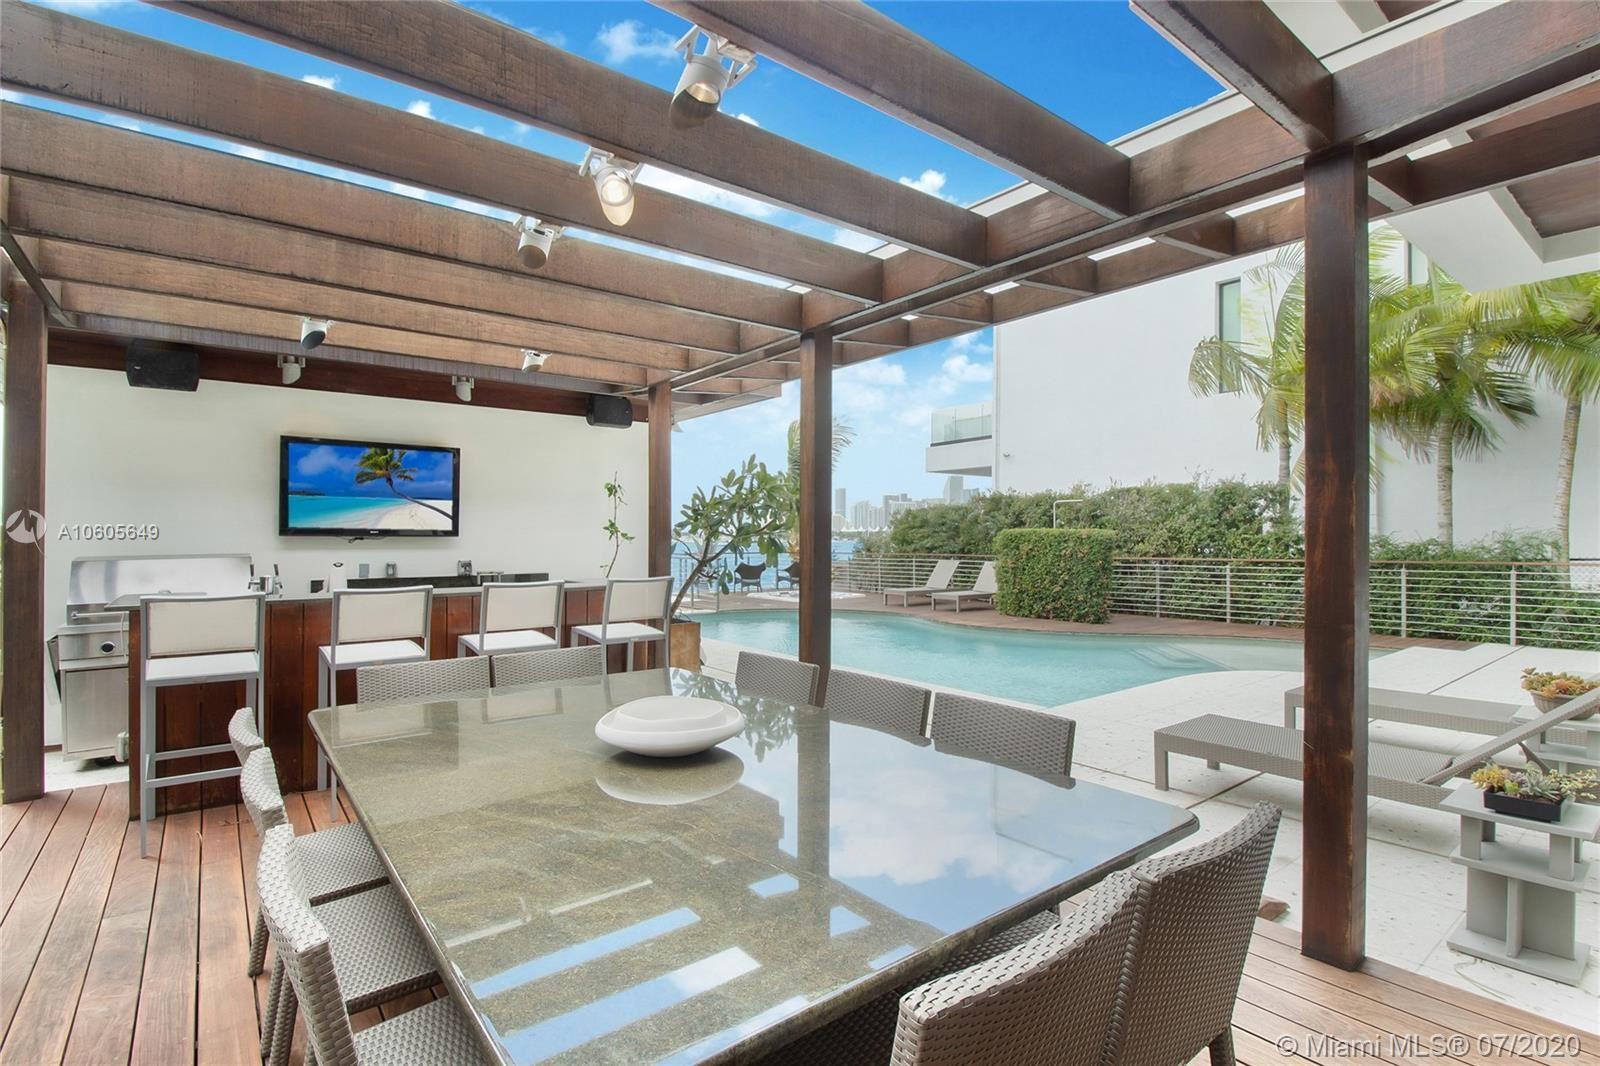 Photo 21 of Listing MLS a10605649 in 1376 S Venetian Way Miami FL 33139